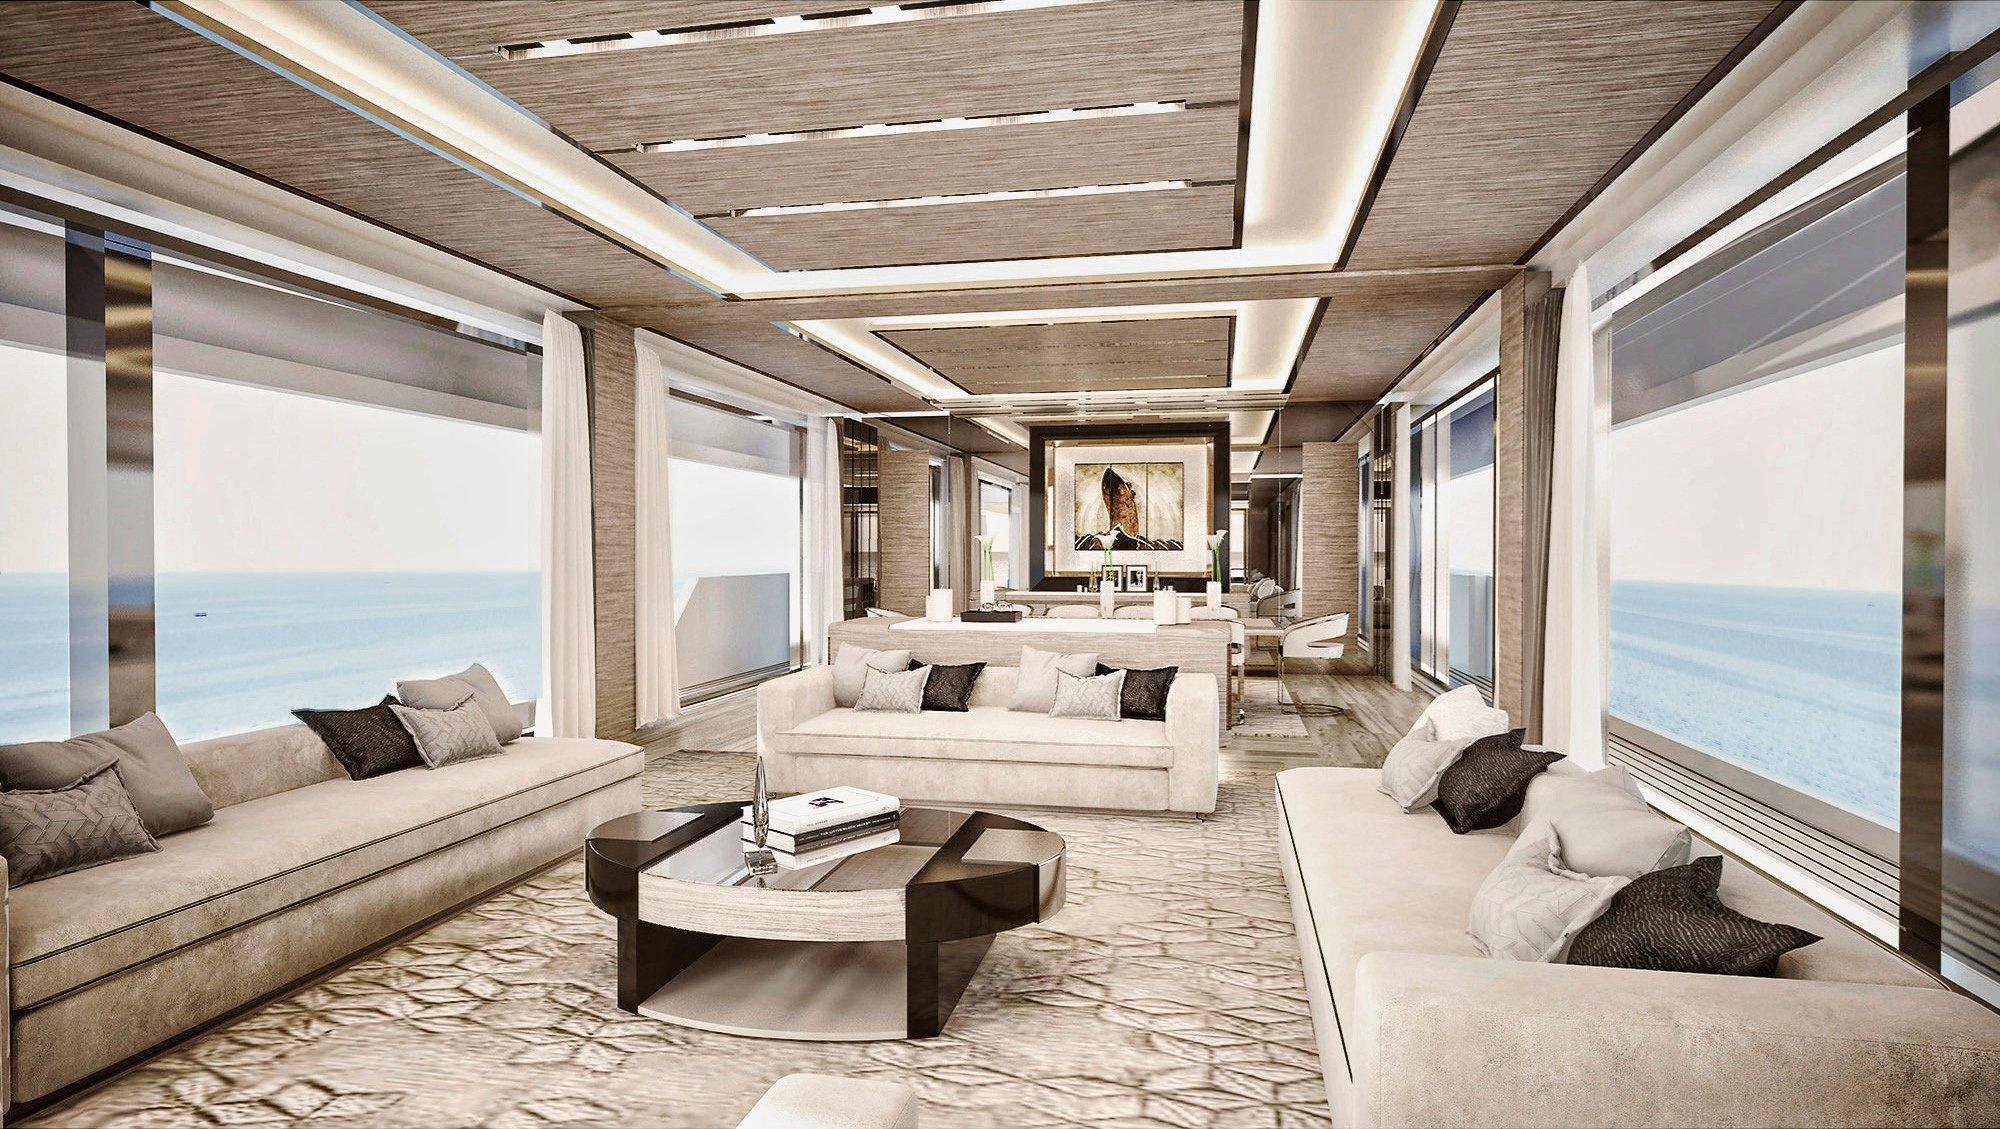 Ducale 118 (8Ducale 118 Explorer Yacht Interior Design Saloon Render